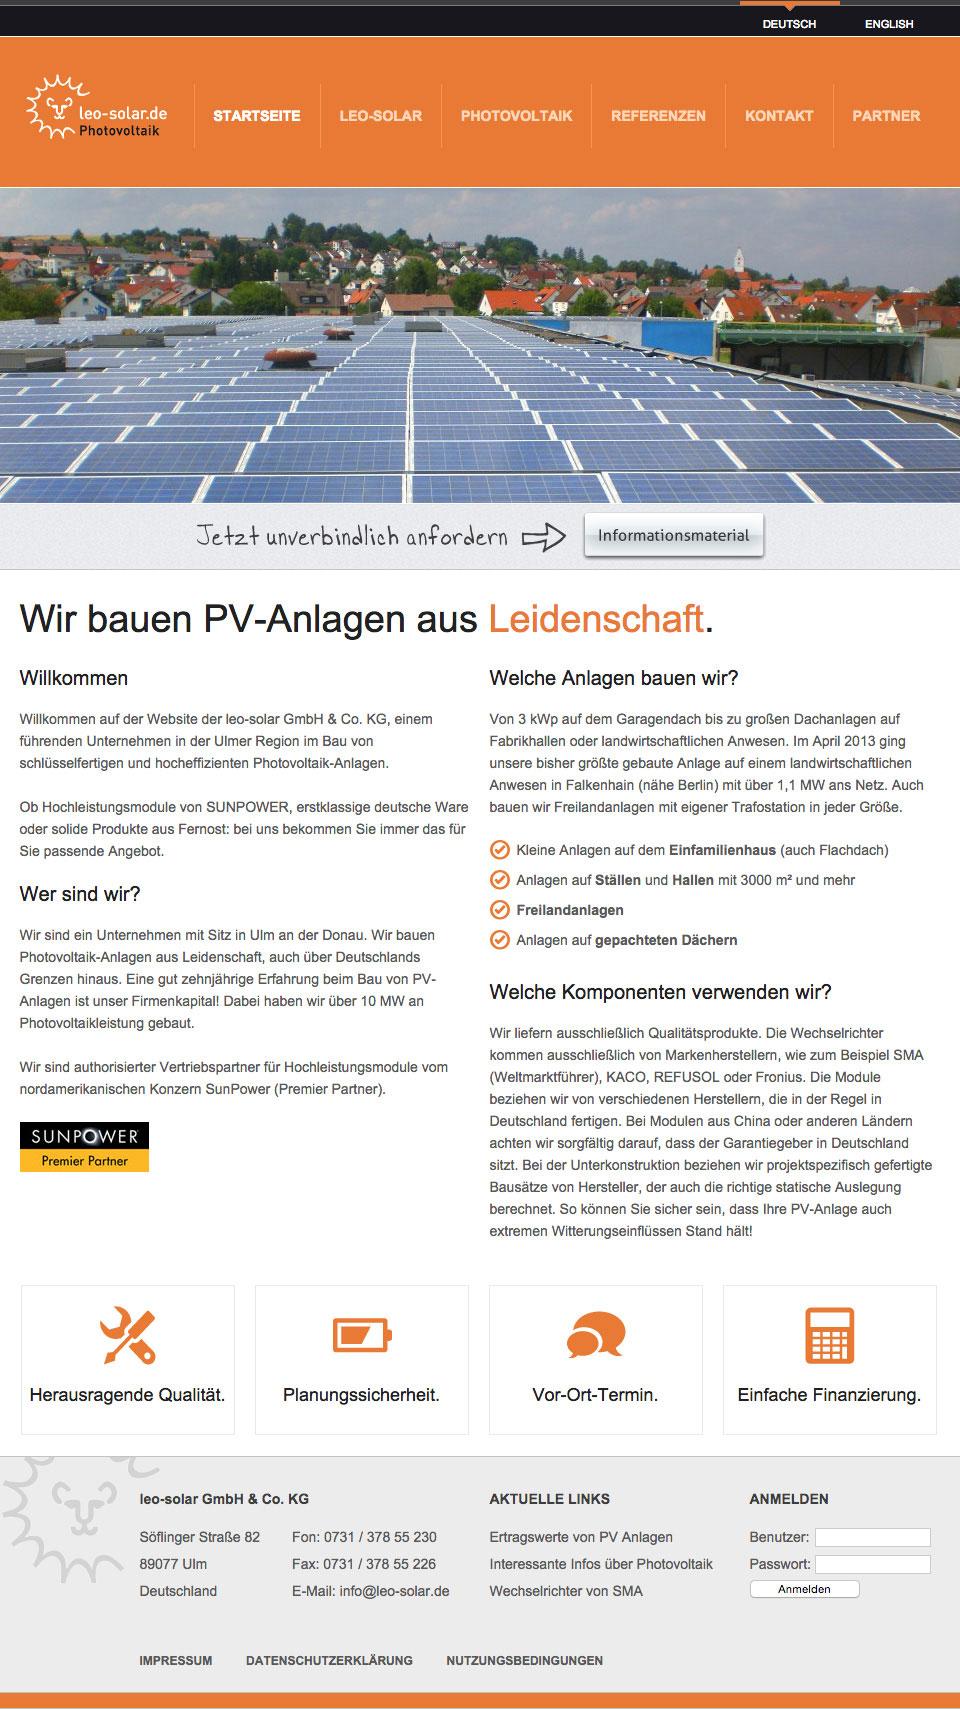 leo-solar-photovoltaik-image-1